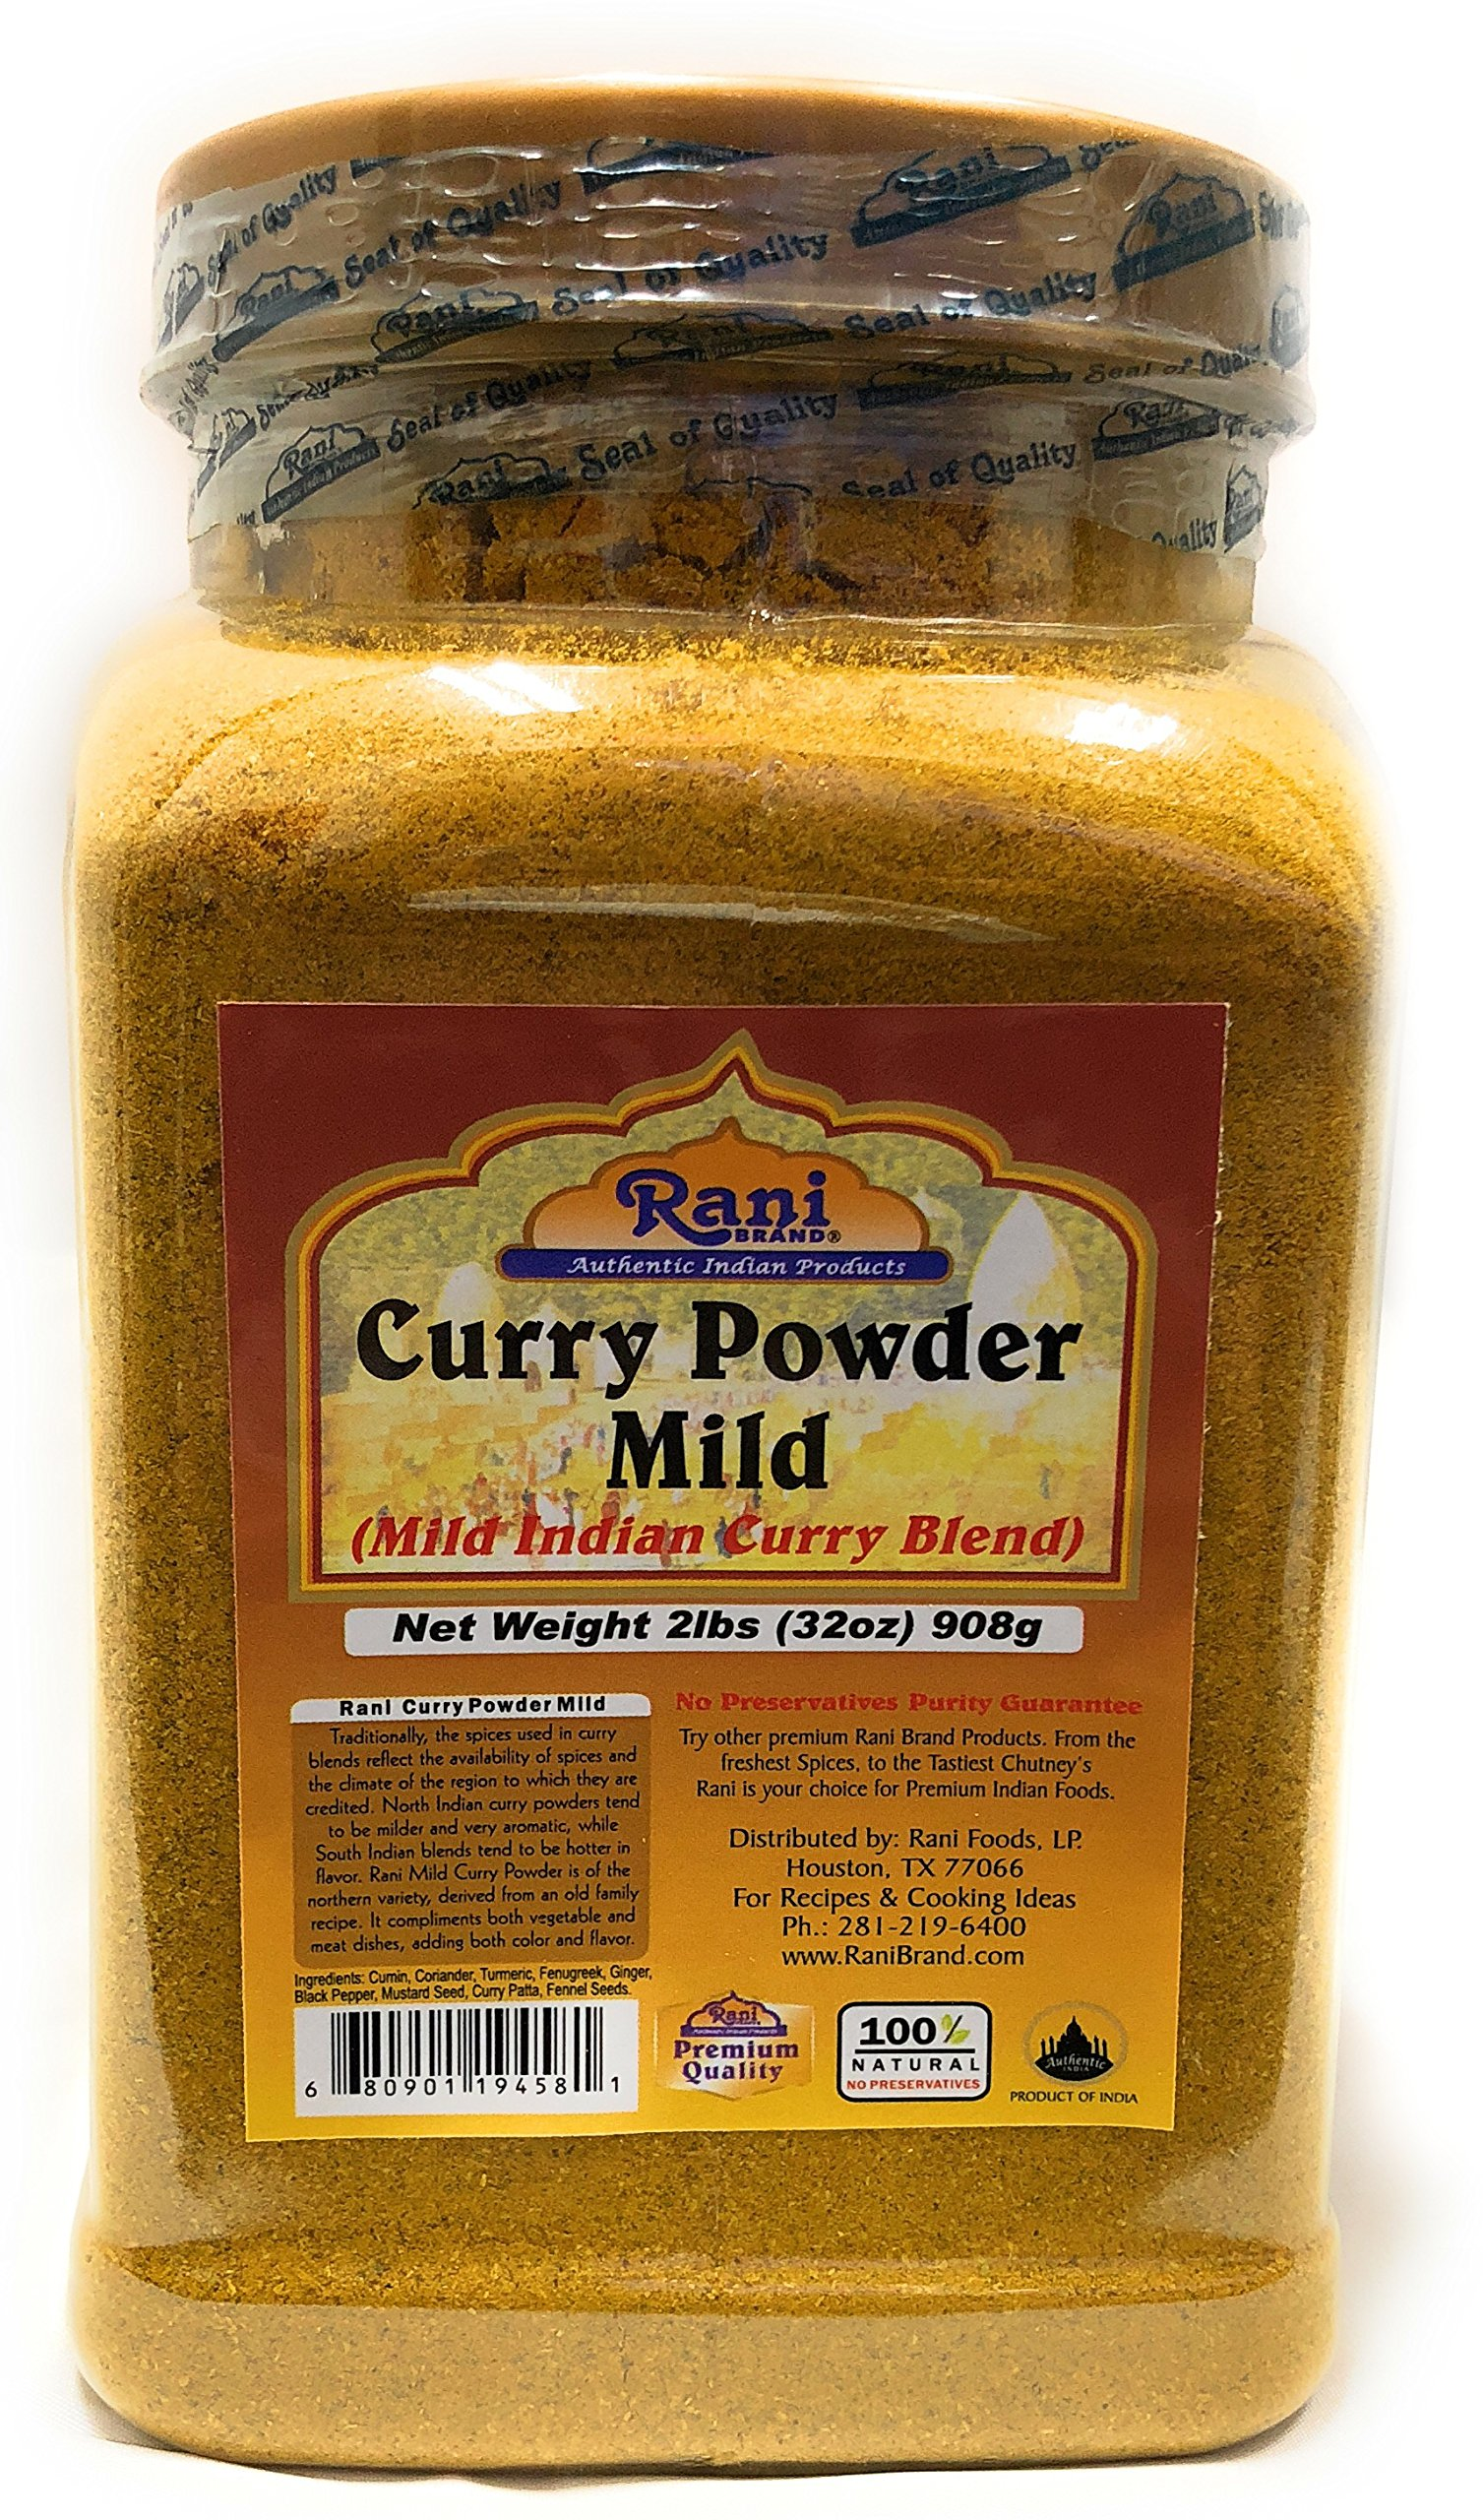 Rani Curry Powder Mild Natural 10-Spice Blend 2lb (32oz) Salt Free ~ Gluten Free Bulk